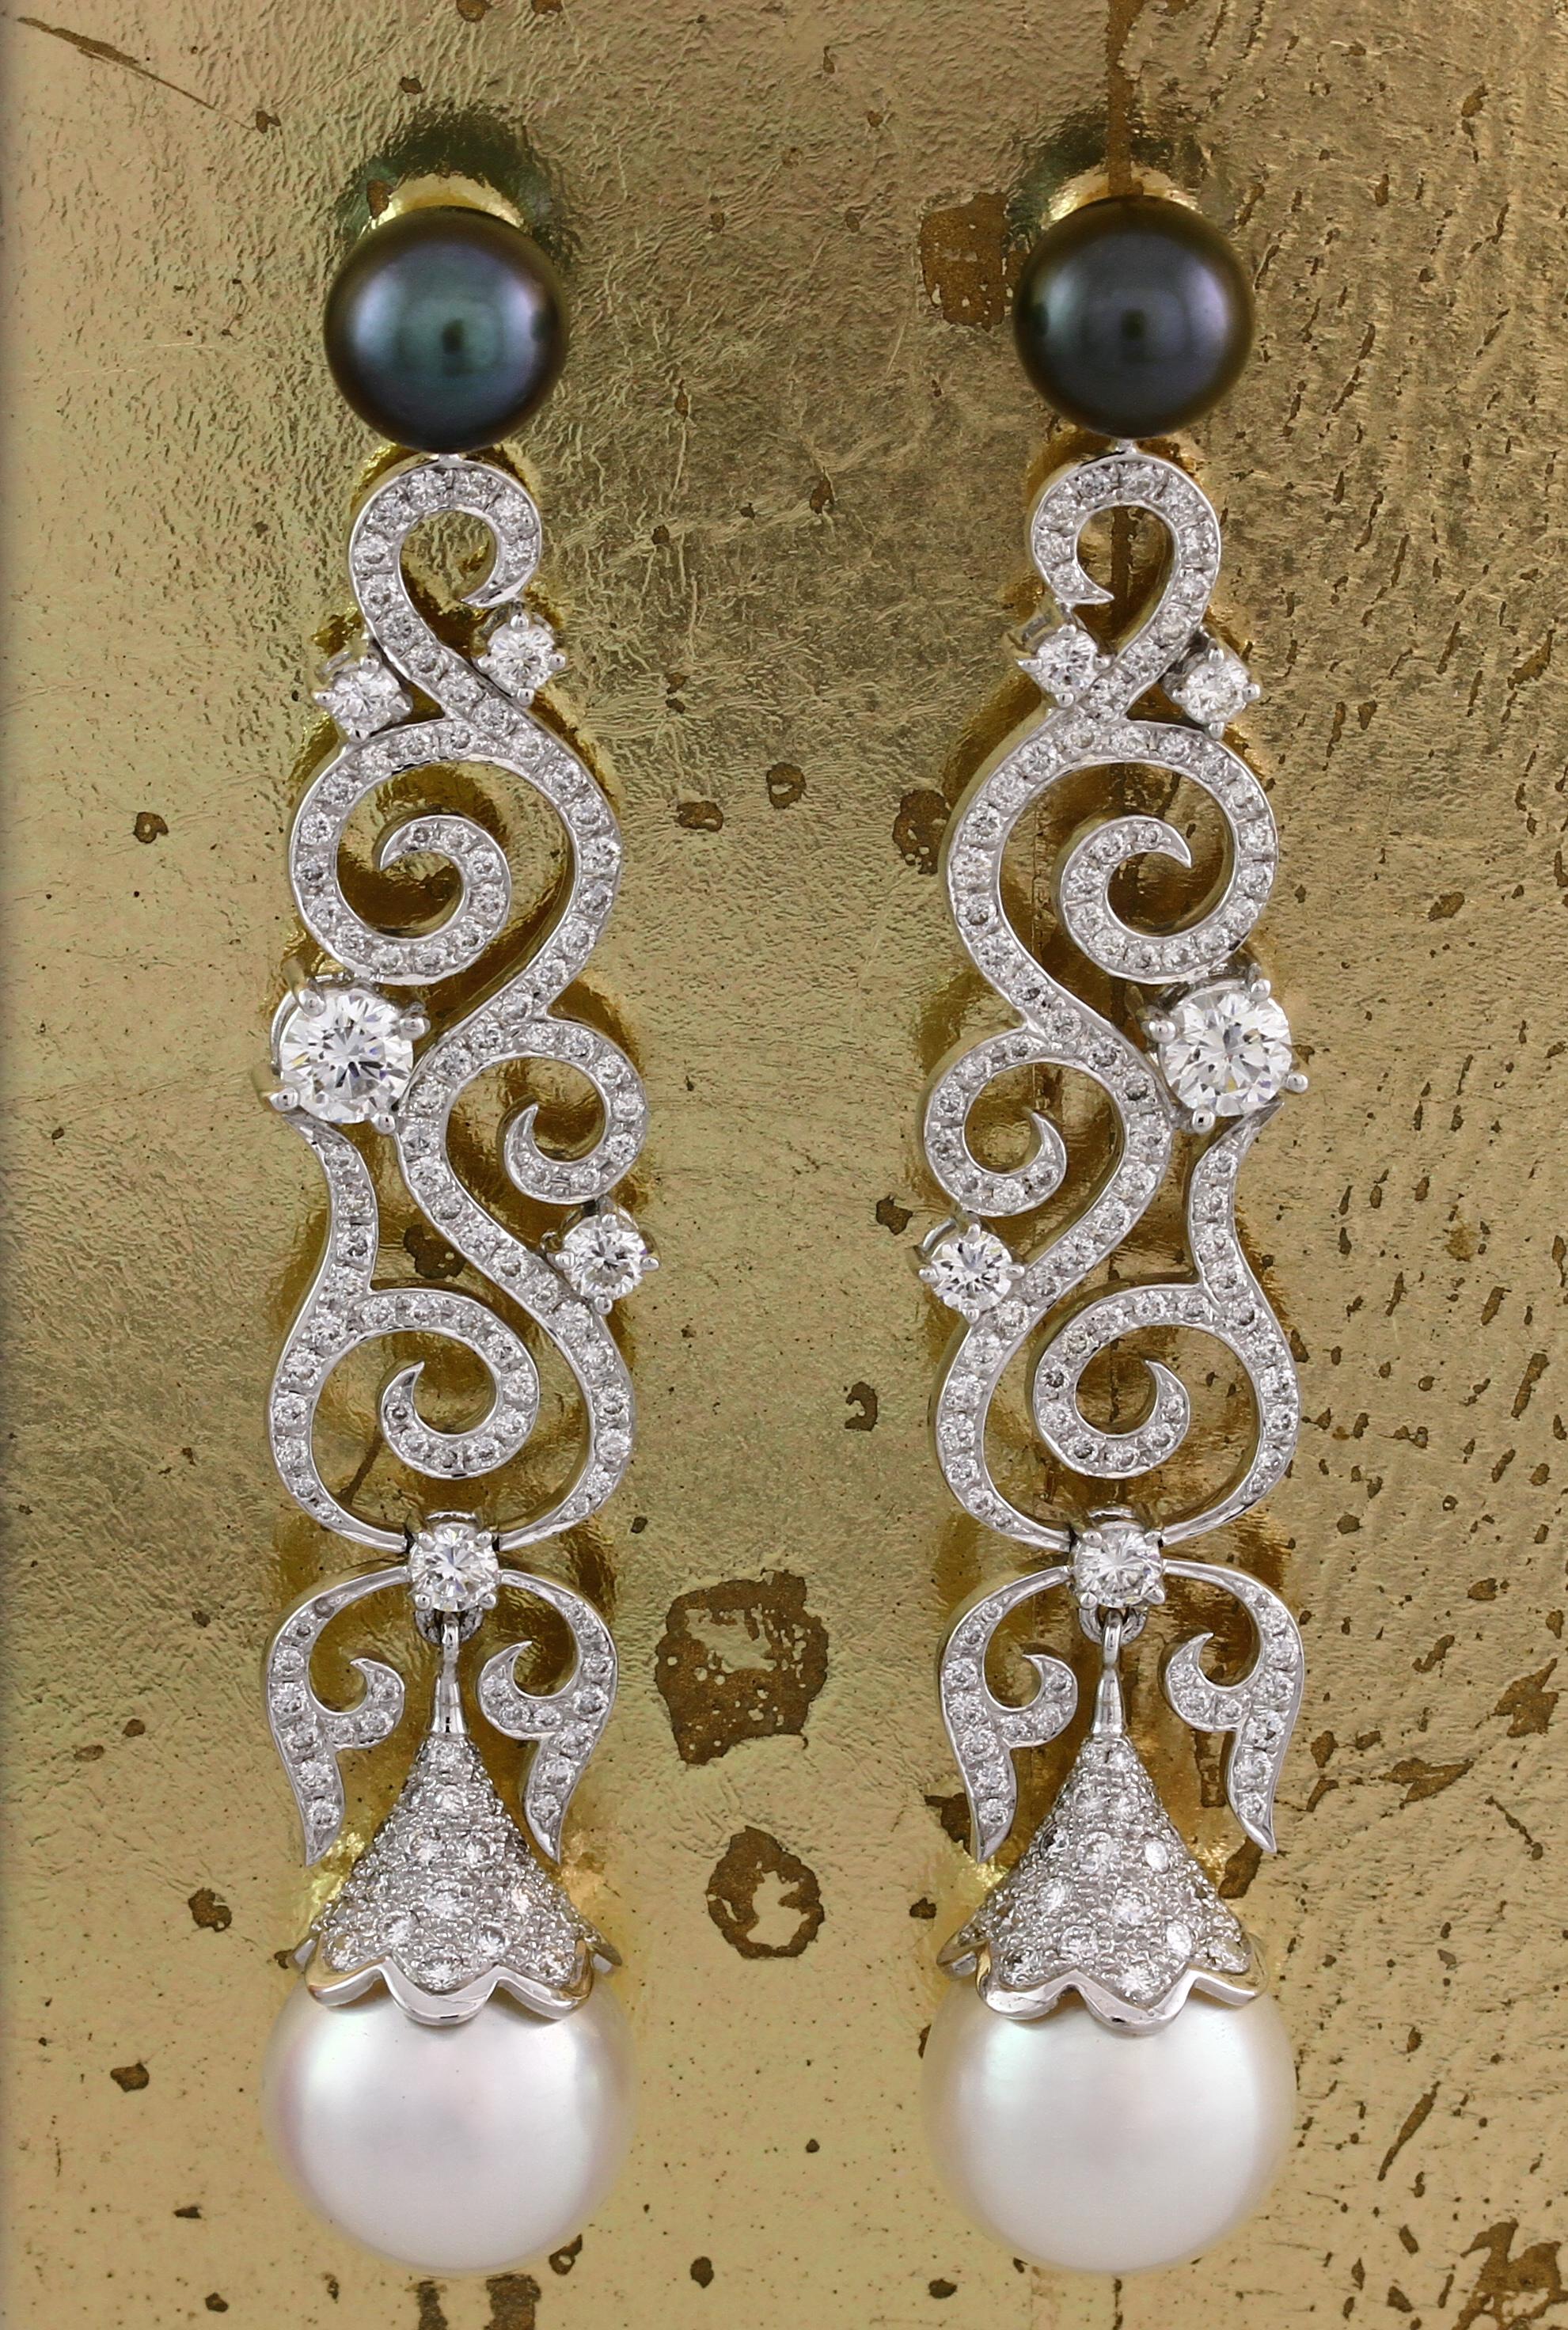 Diamond & Pearl Earrings - Item No: 0013208